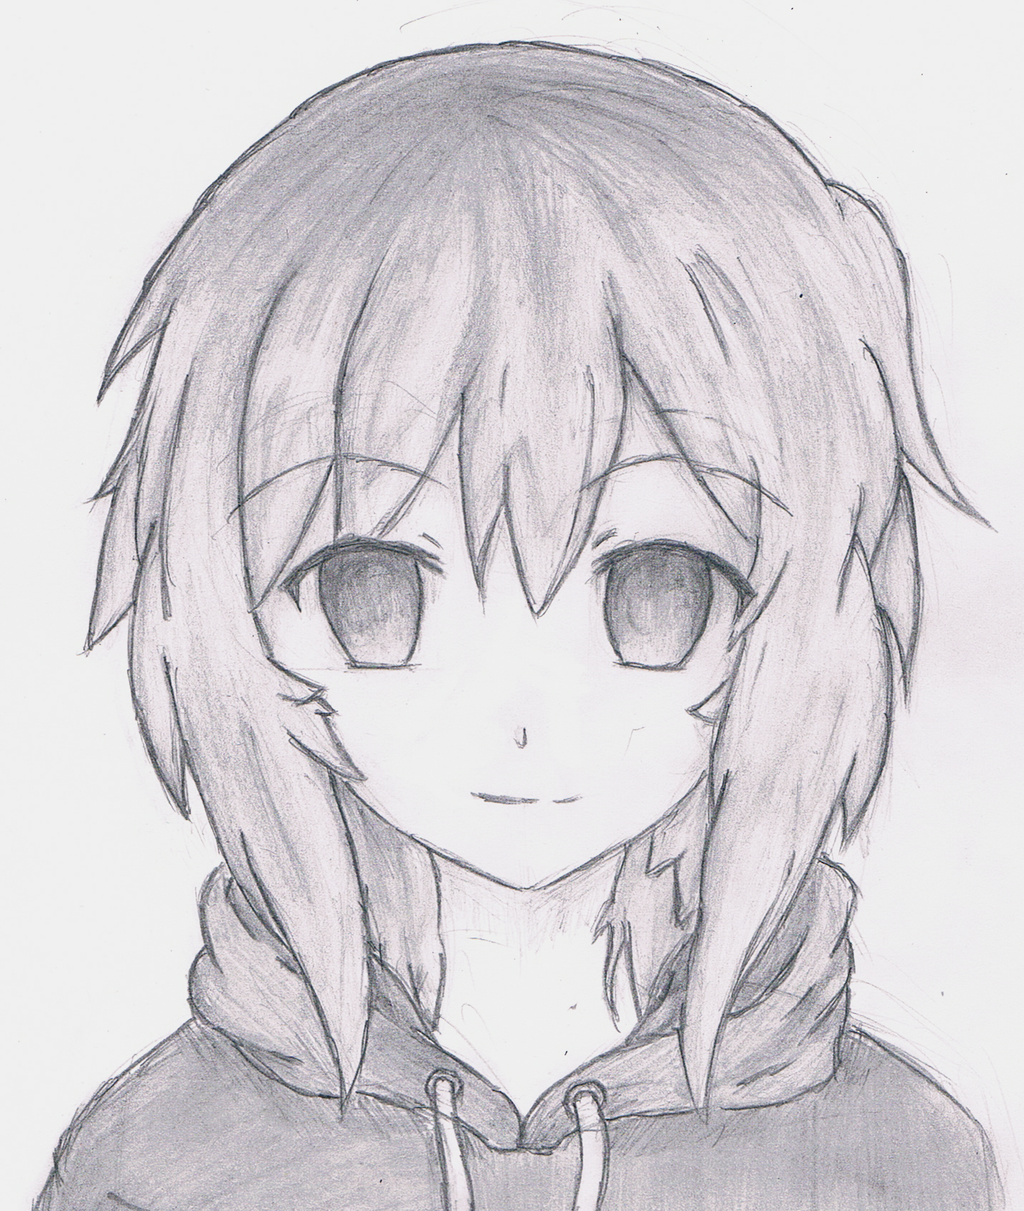 Anime Style By Regexx On DeviantArt